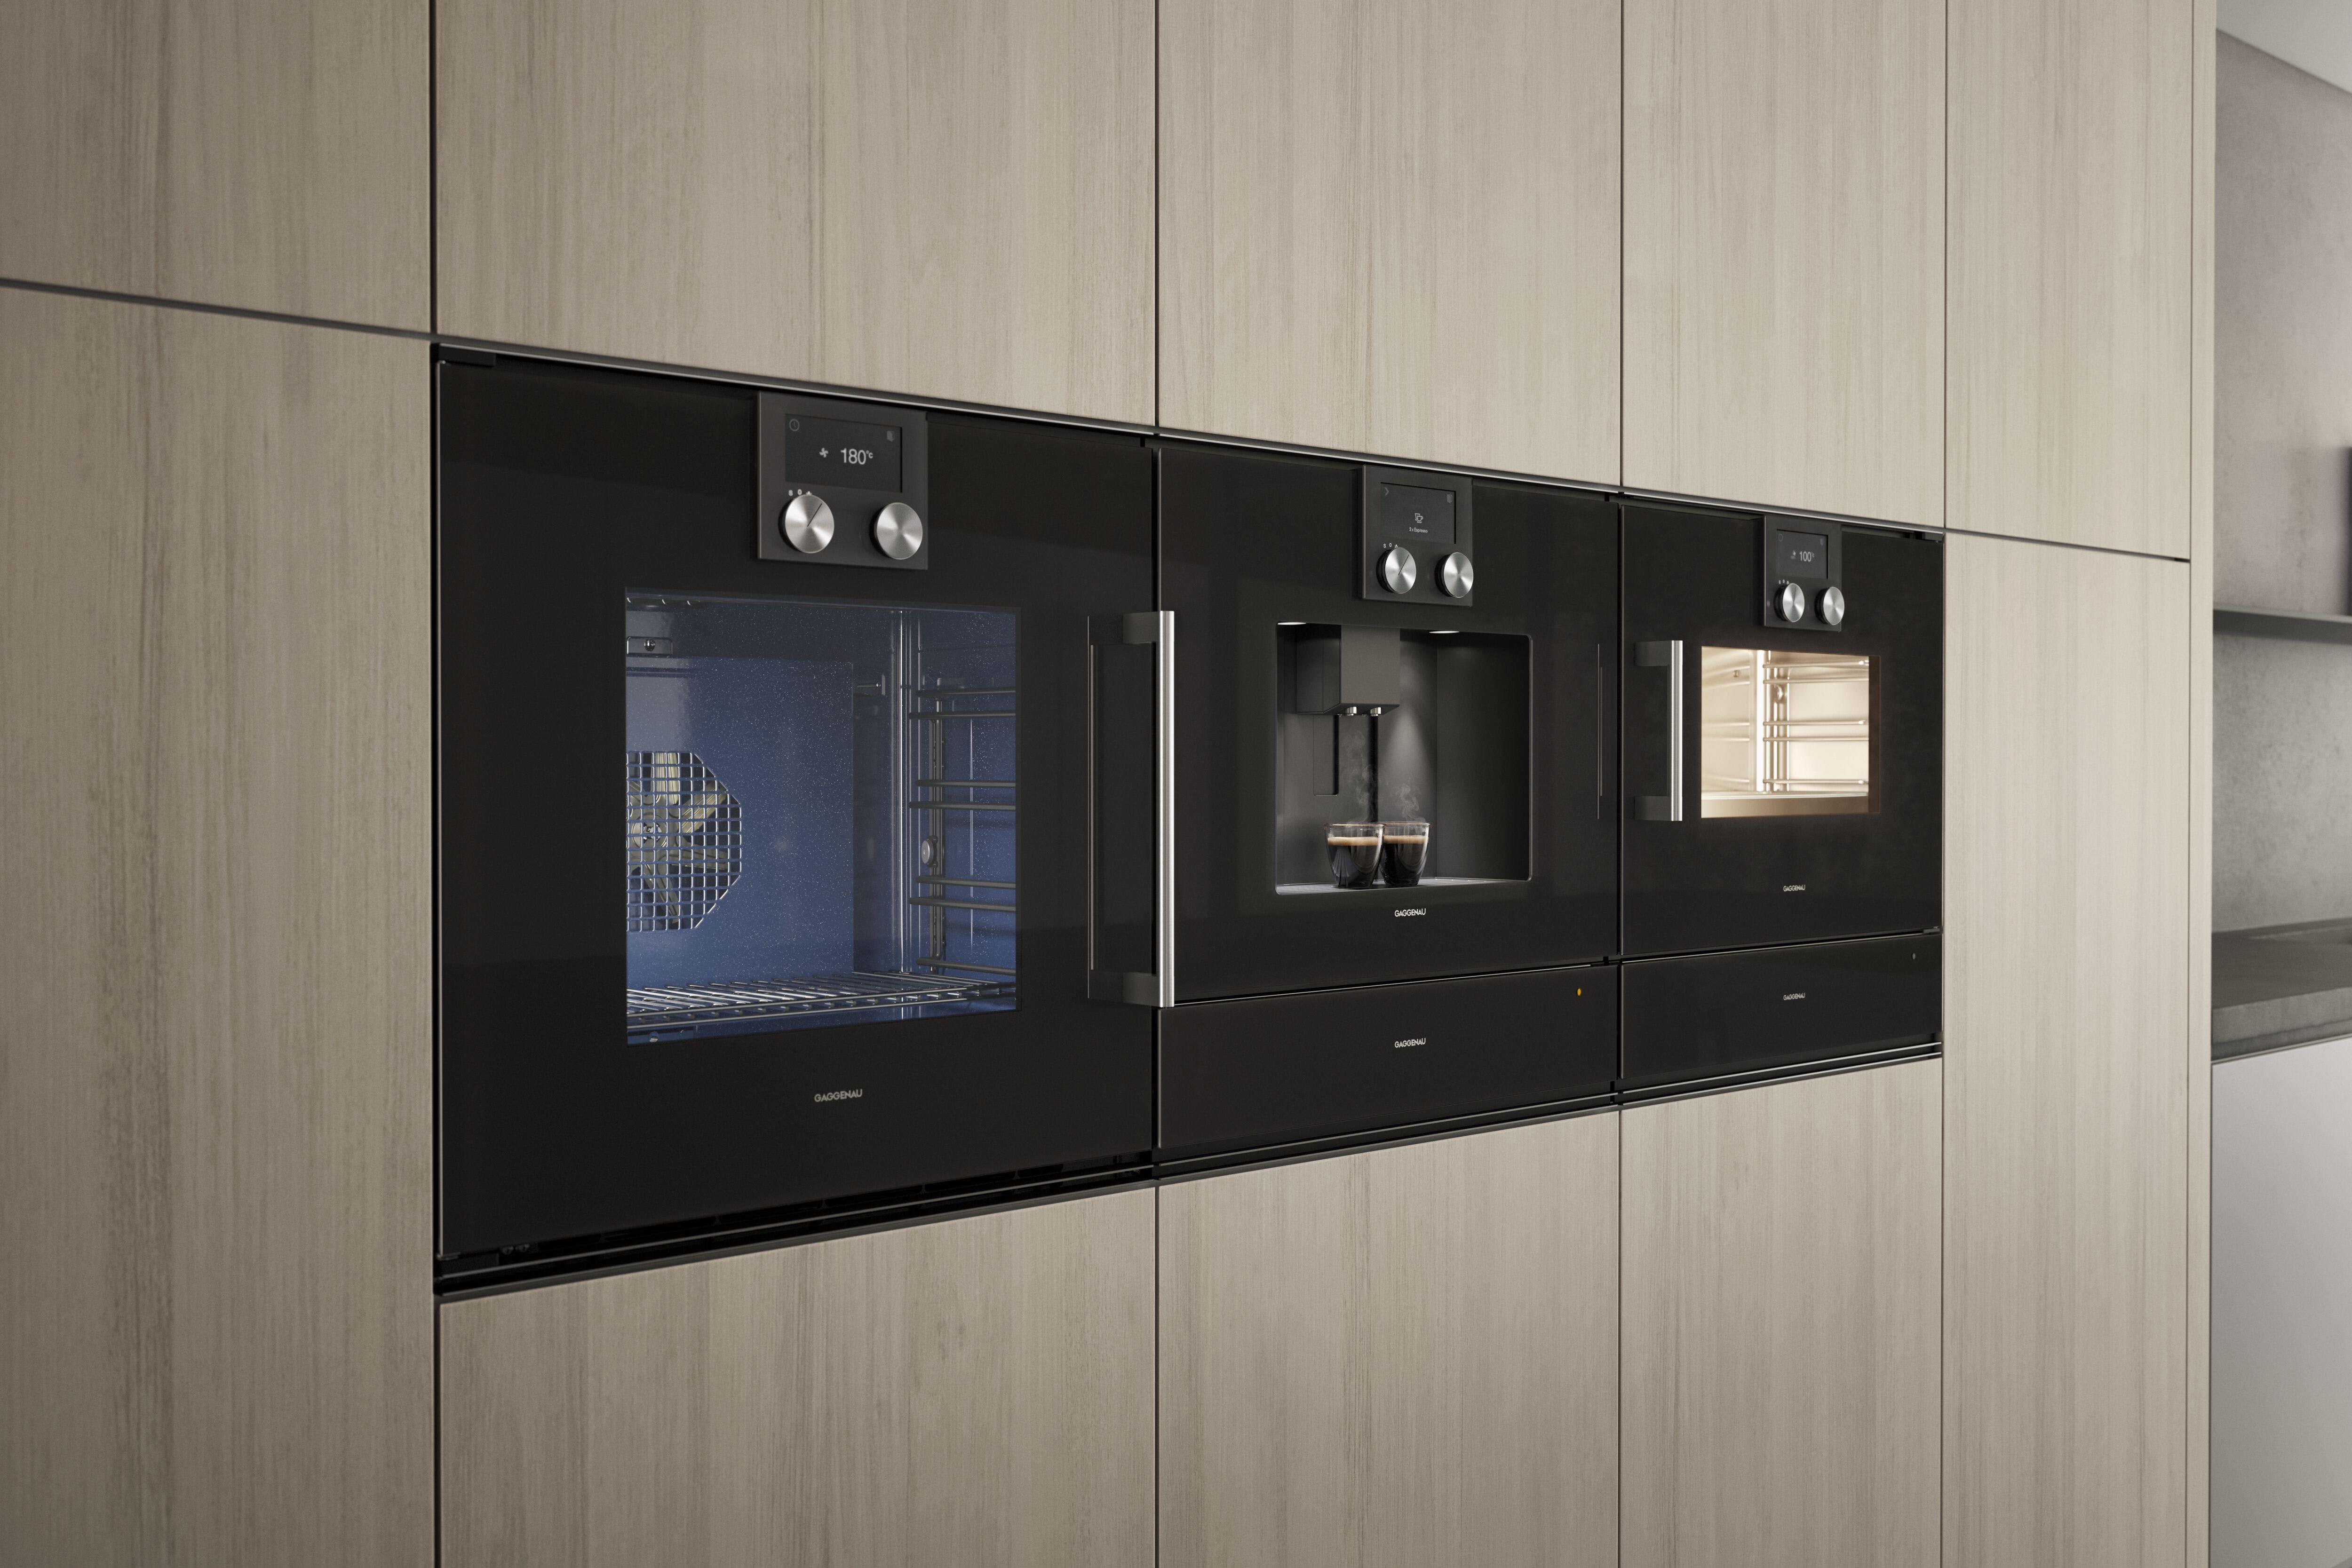 Gaggenau oven, coffee machine and micro wave in kitchen